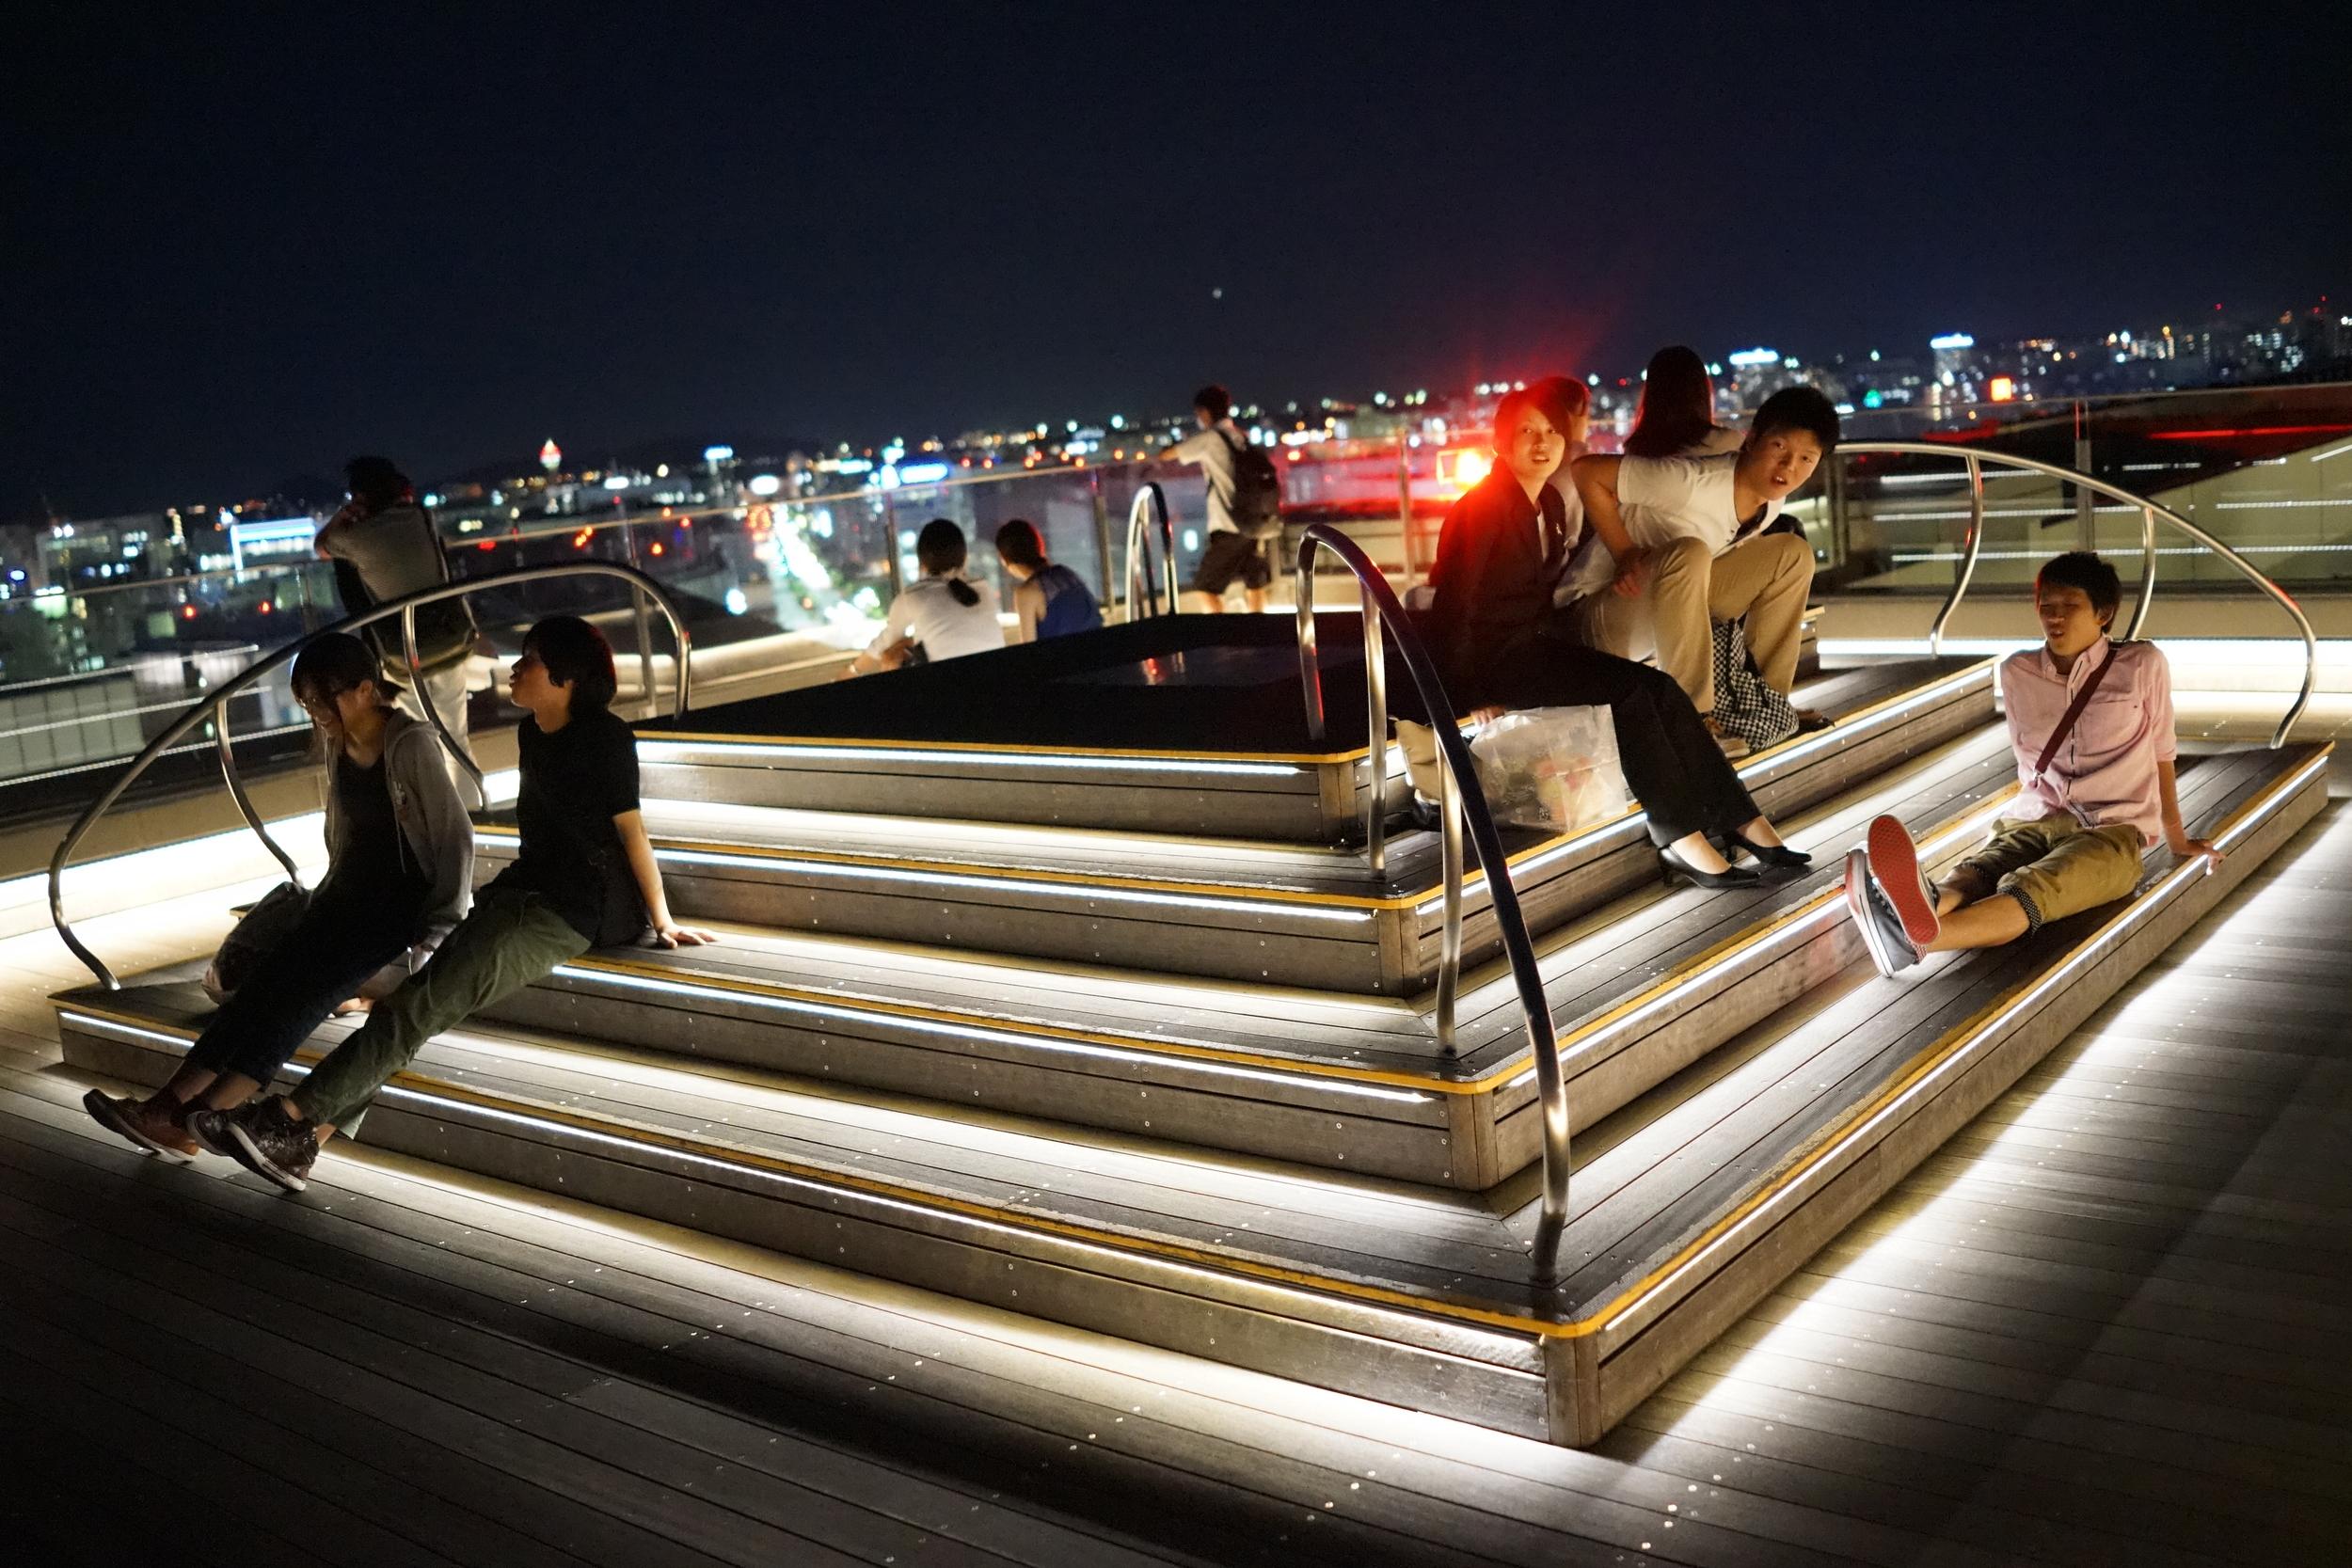 JR Hakata City rooftop deck, Fukuoka